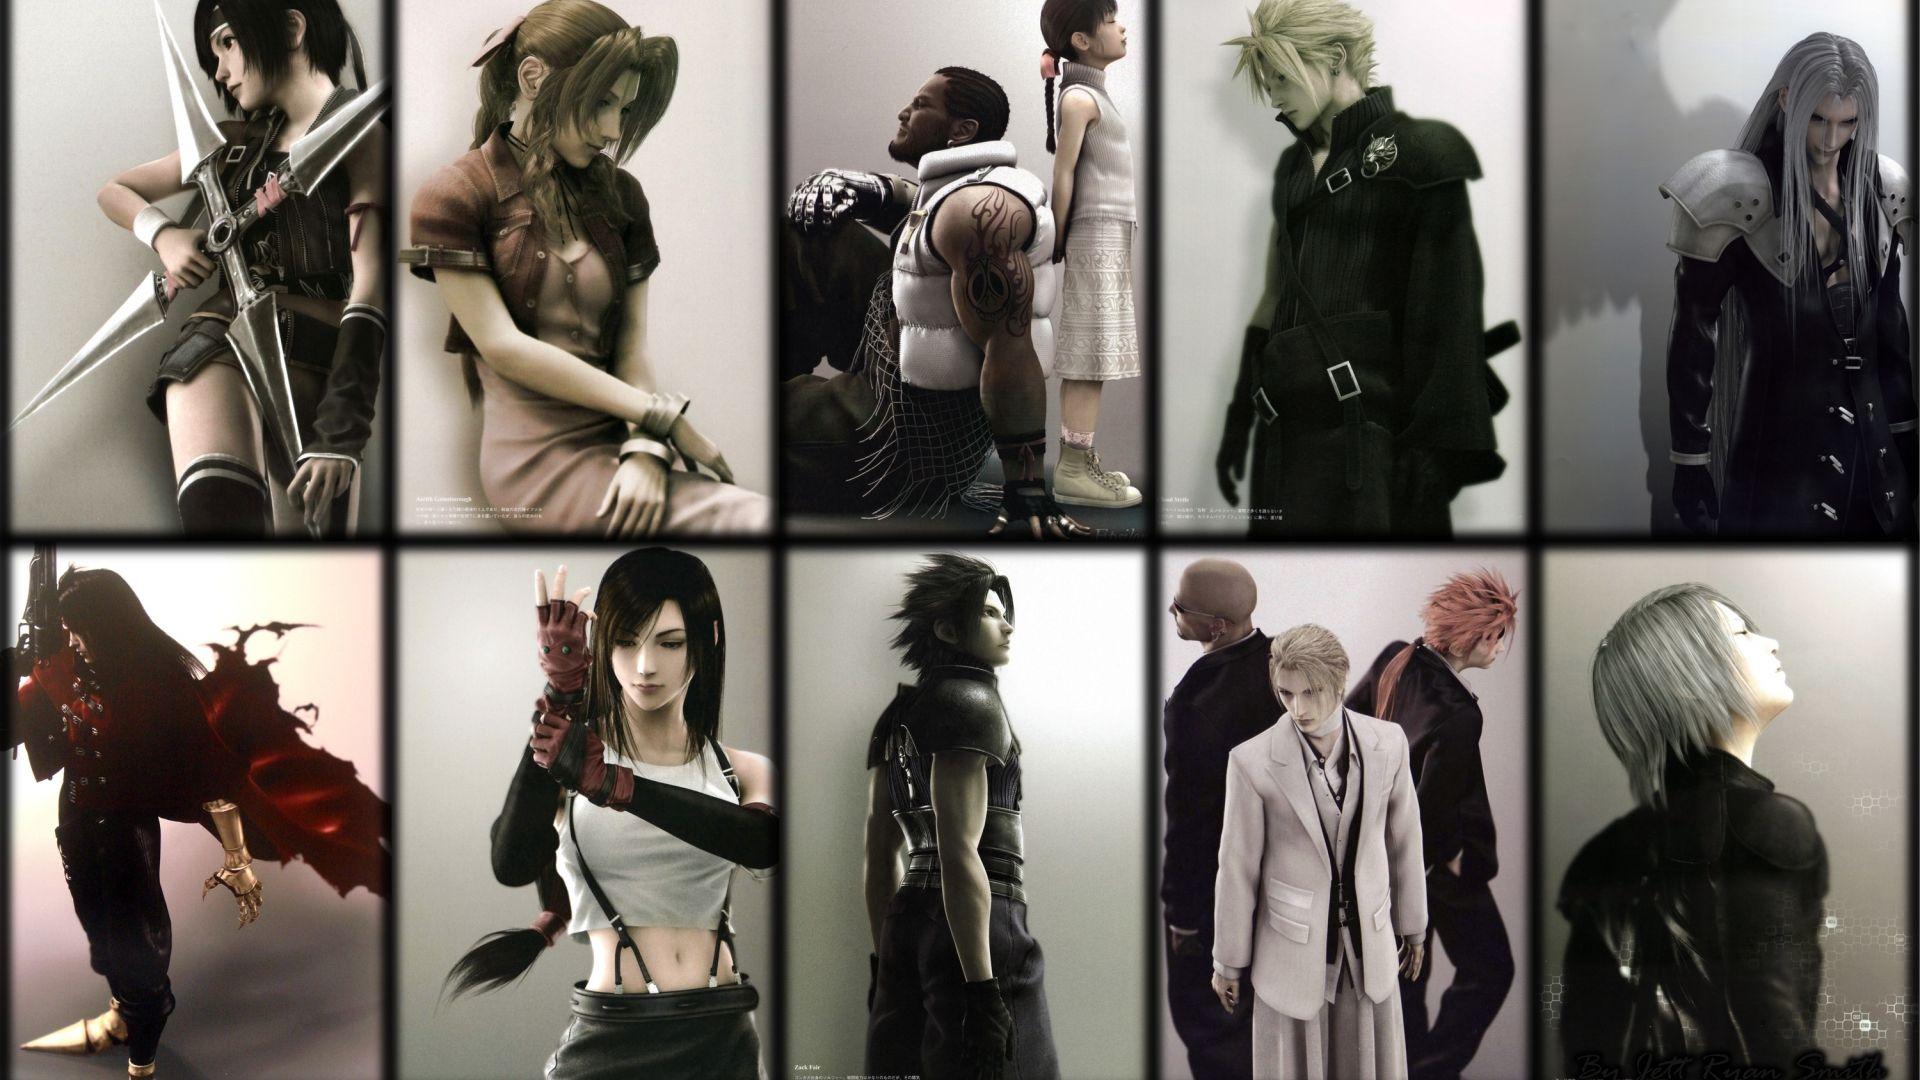 Final Fantasy Vii Girls